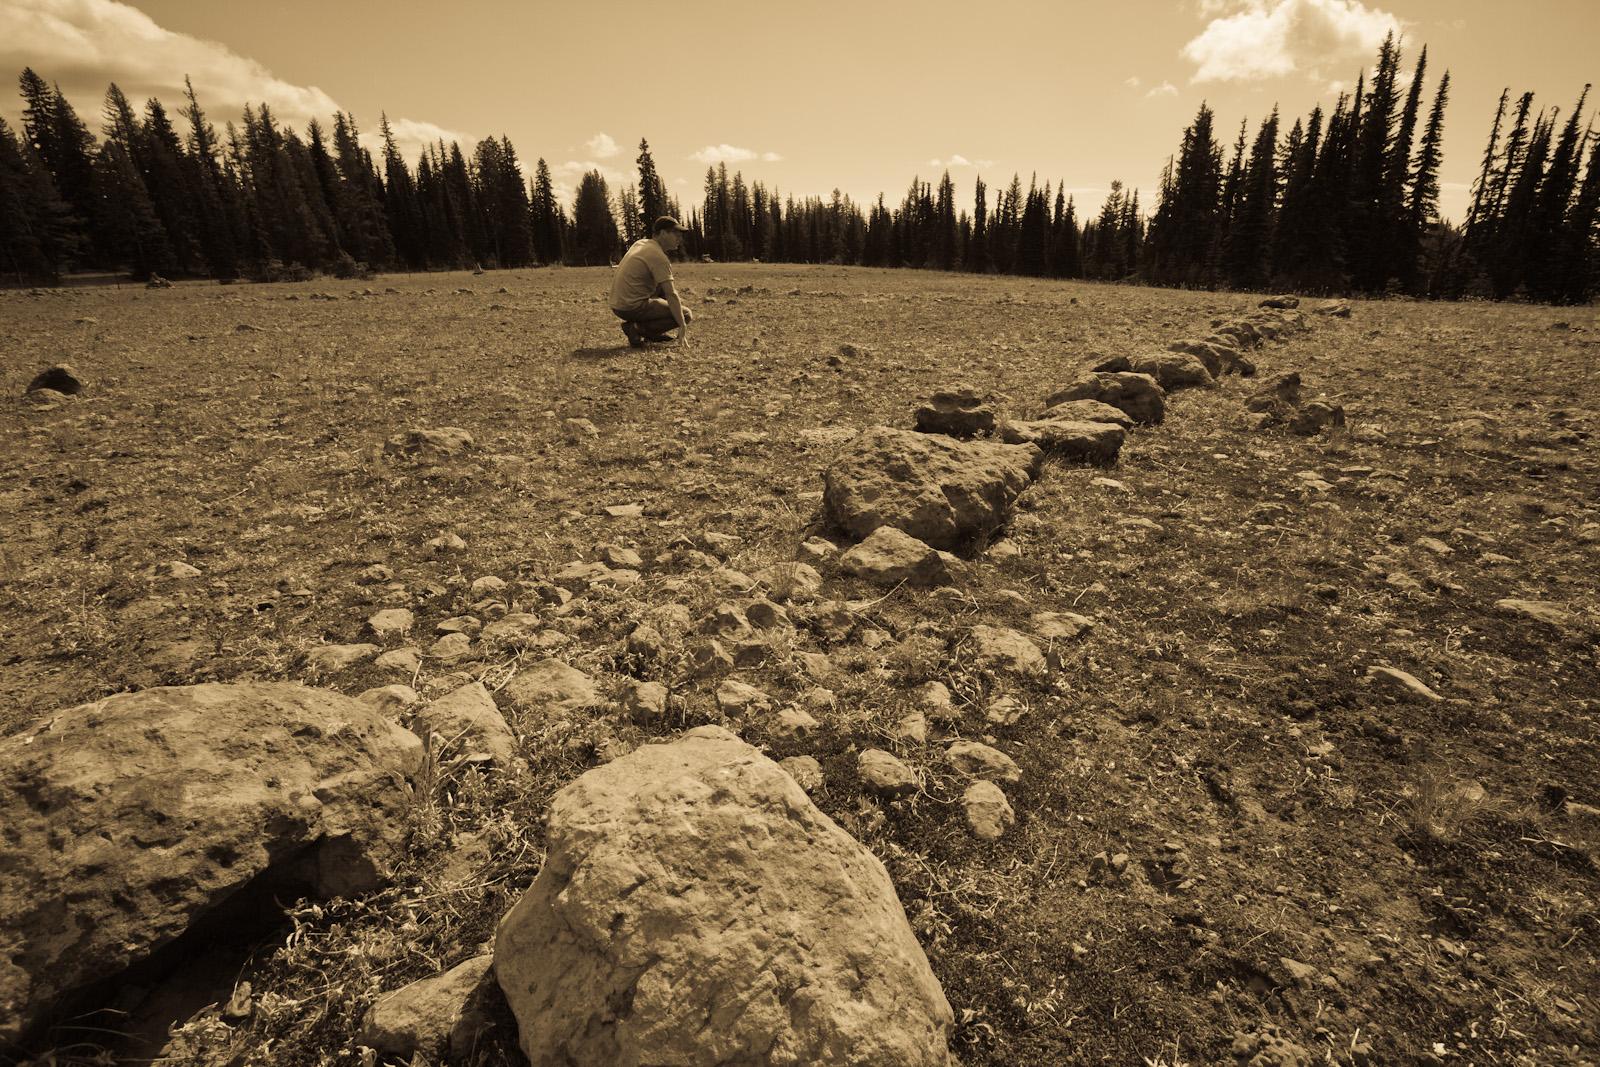 Mt. Misery CCC Camp <br> (SE_WA_082912_0628-18.jpg)